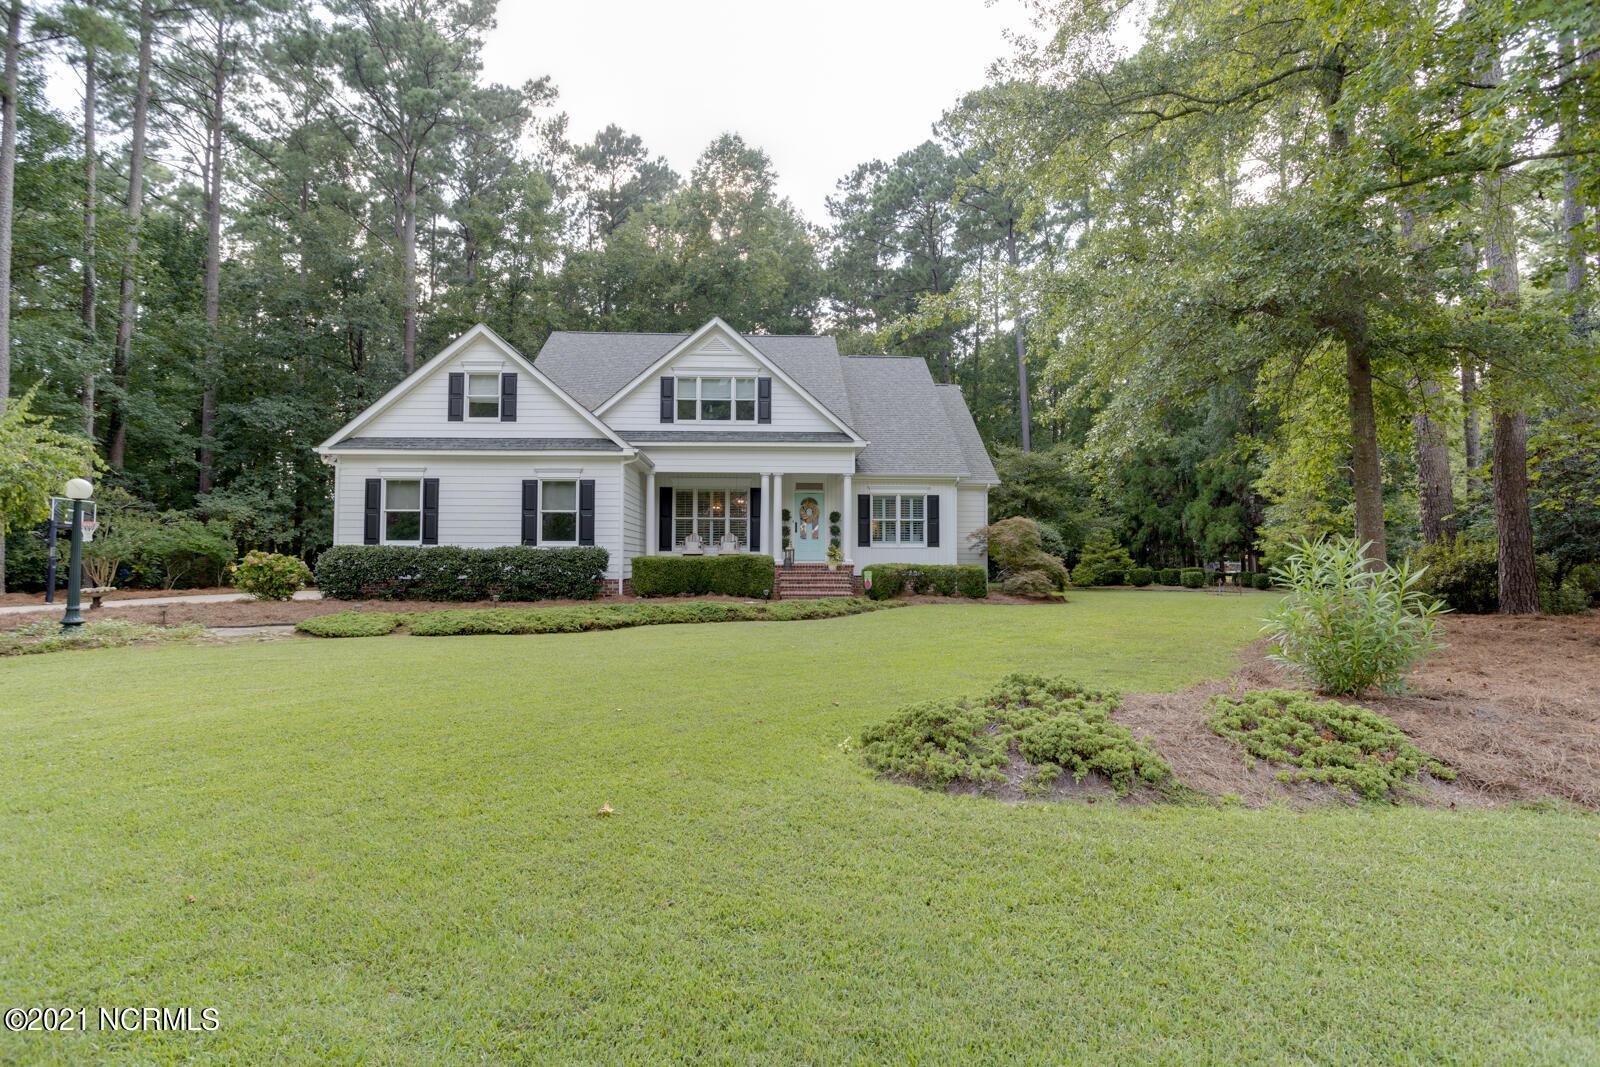 204 Rappahannock Drive, Chocowinity, North Carolina 27817, 4 Bedrooms Bedrooms, 12 Rooms Rooms,3 BathroomsBathrooms,Single family residence,For sale,Rappahannock,100289717